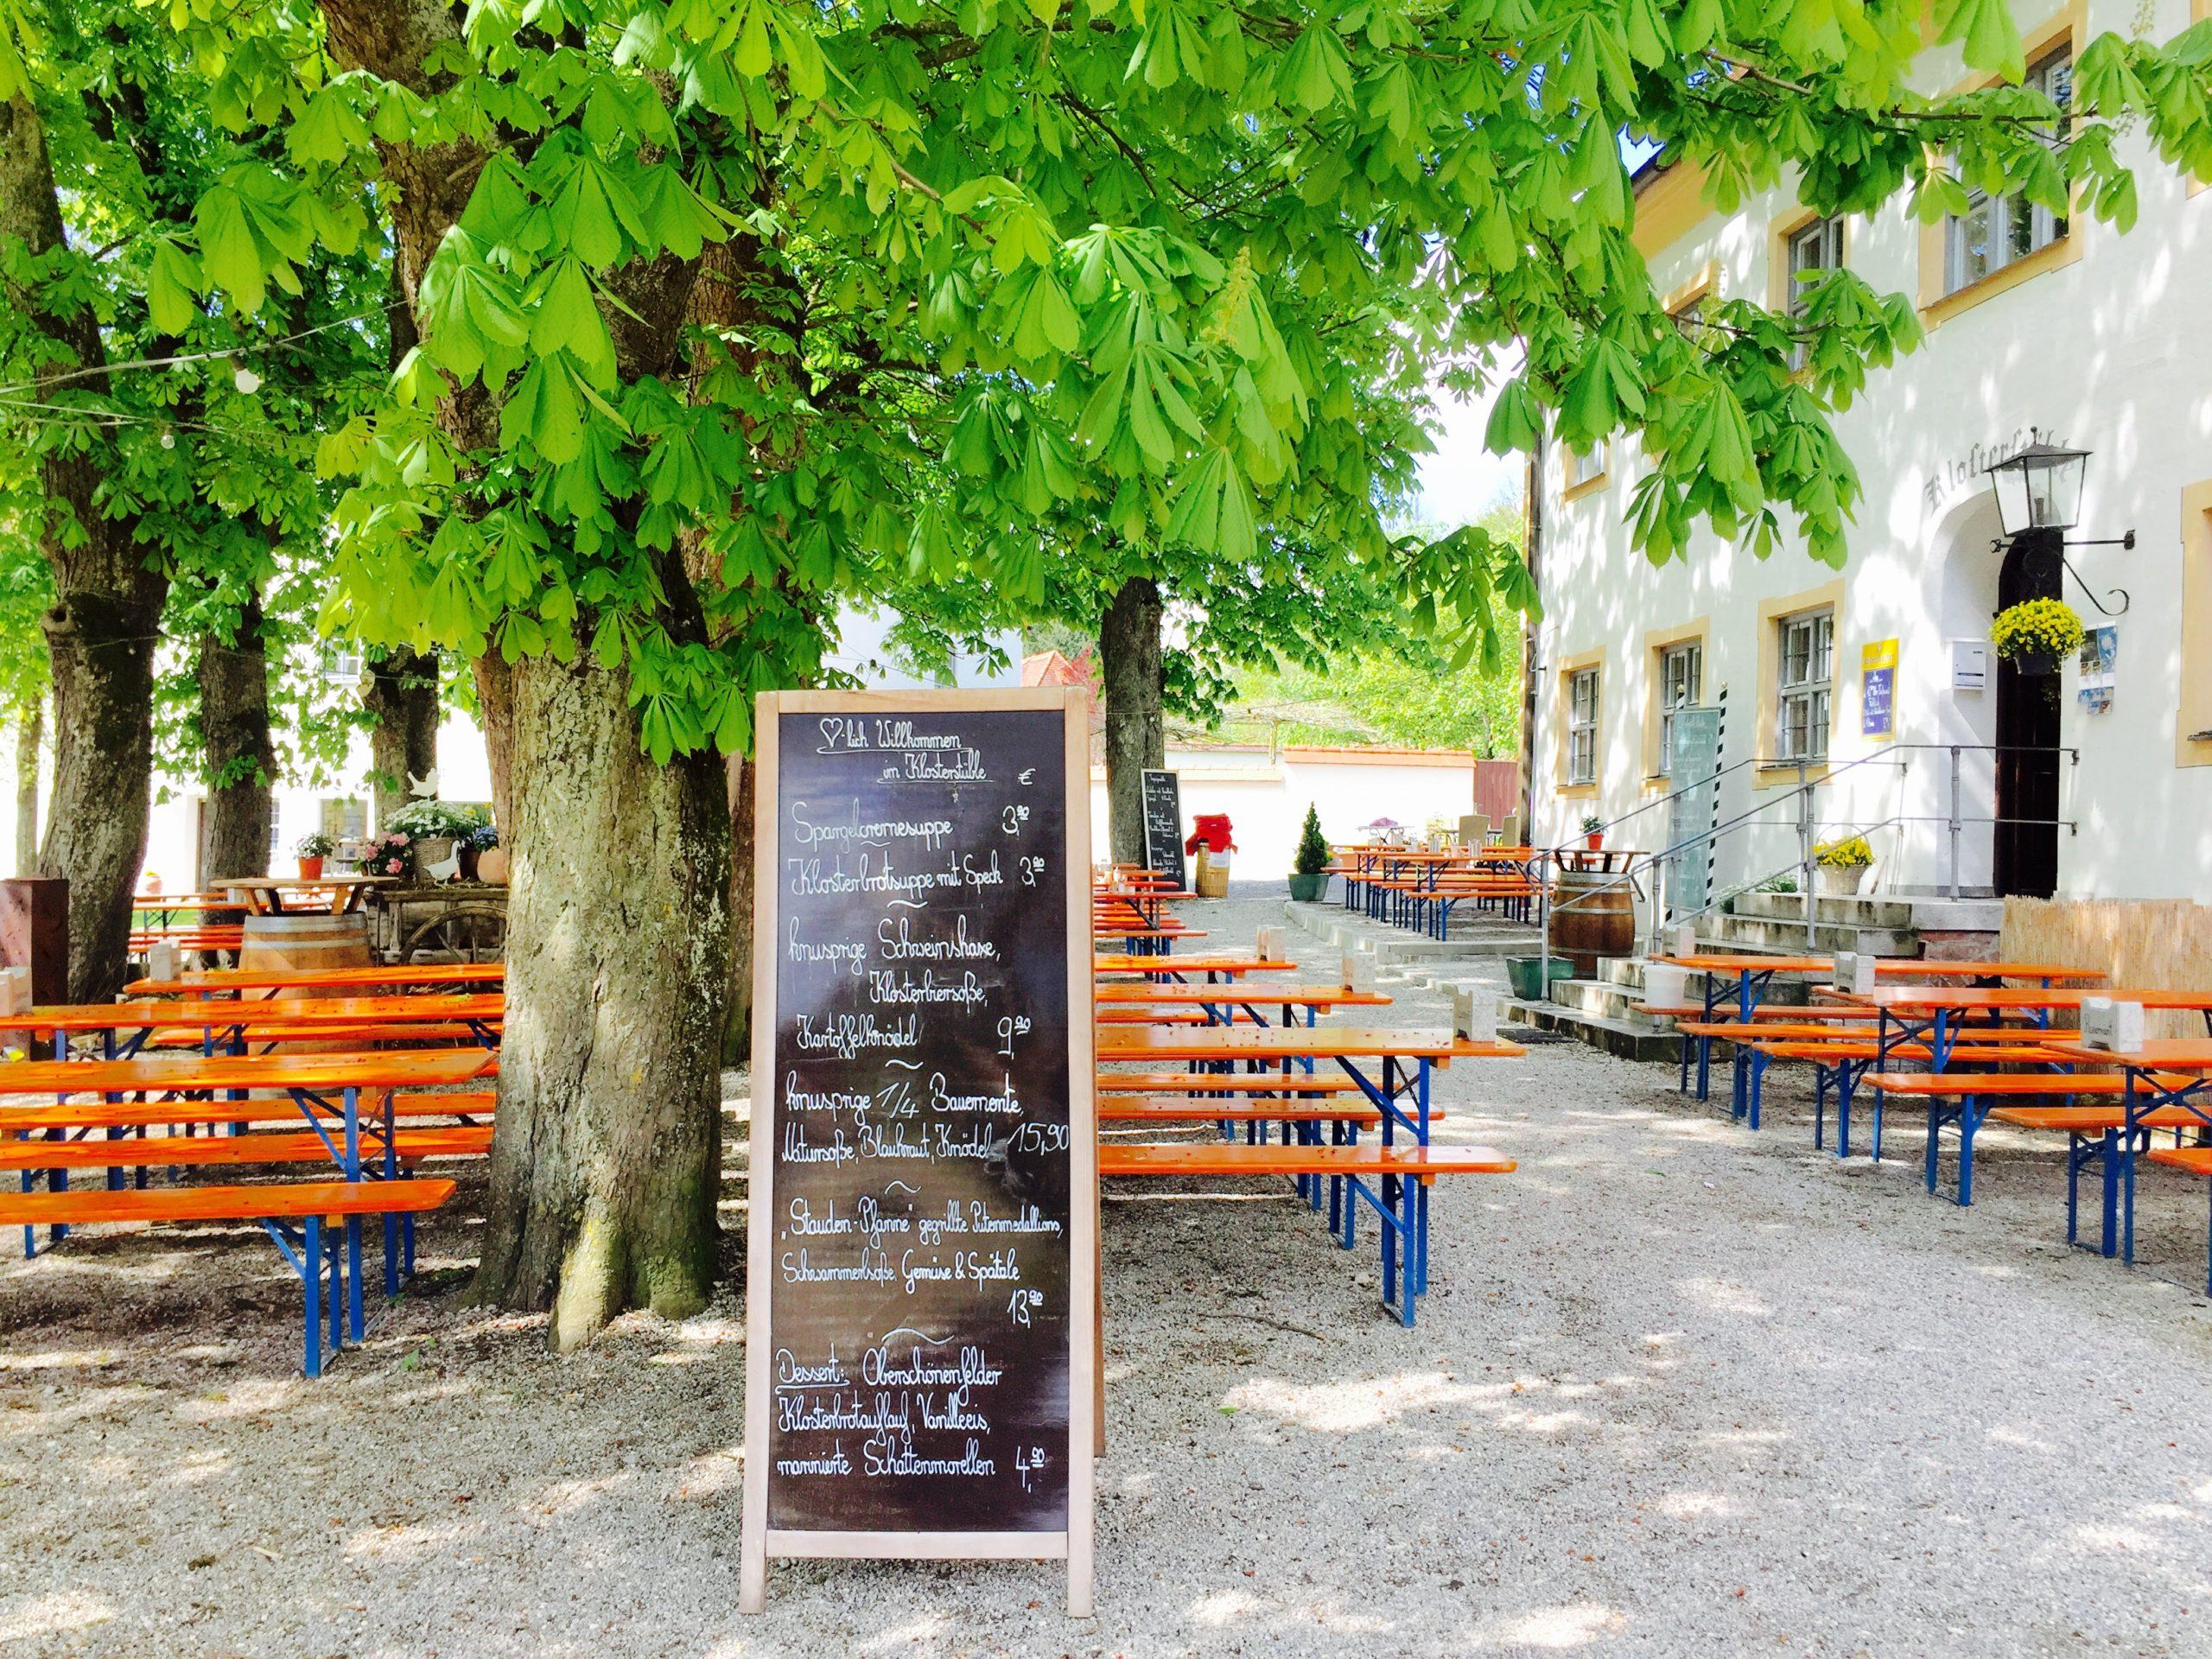 Biergarten beim Kloster Oberschönenfeld